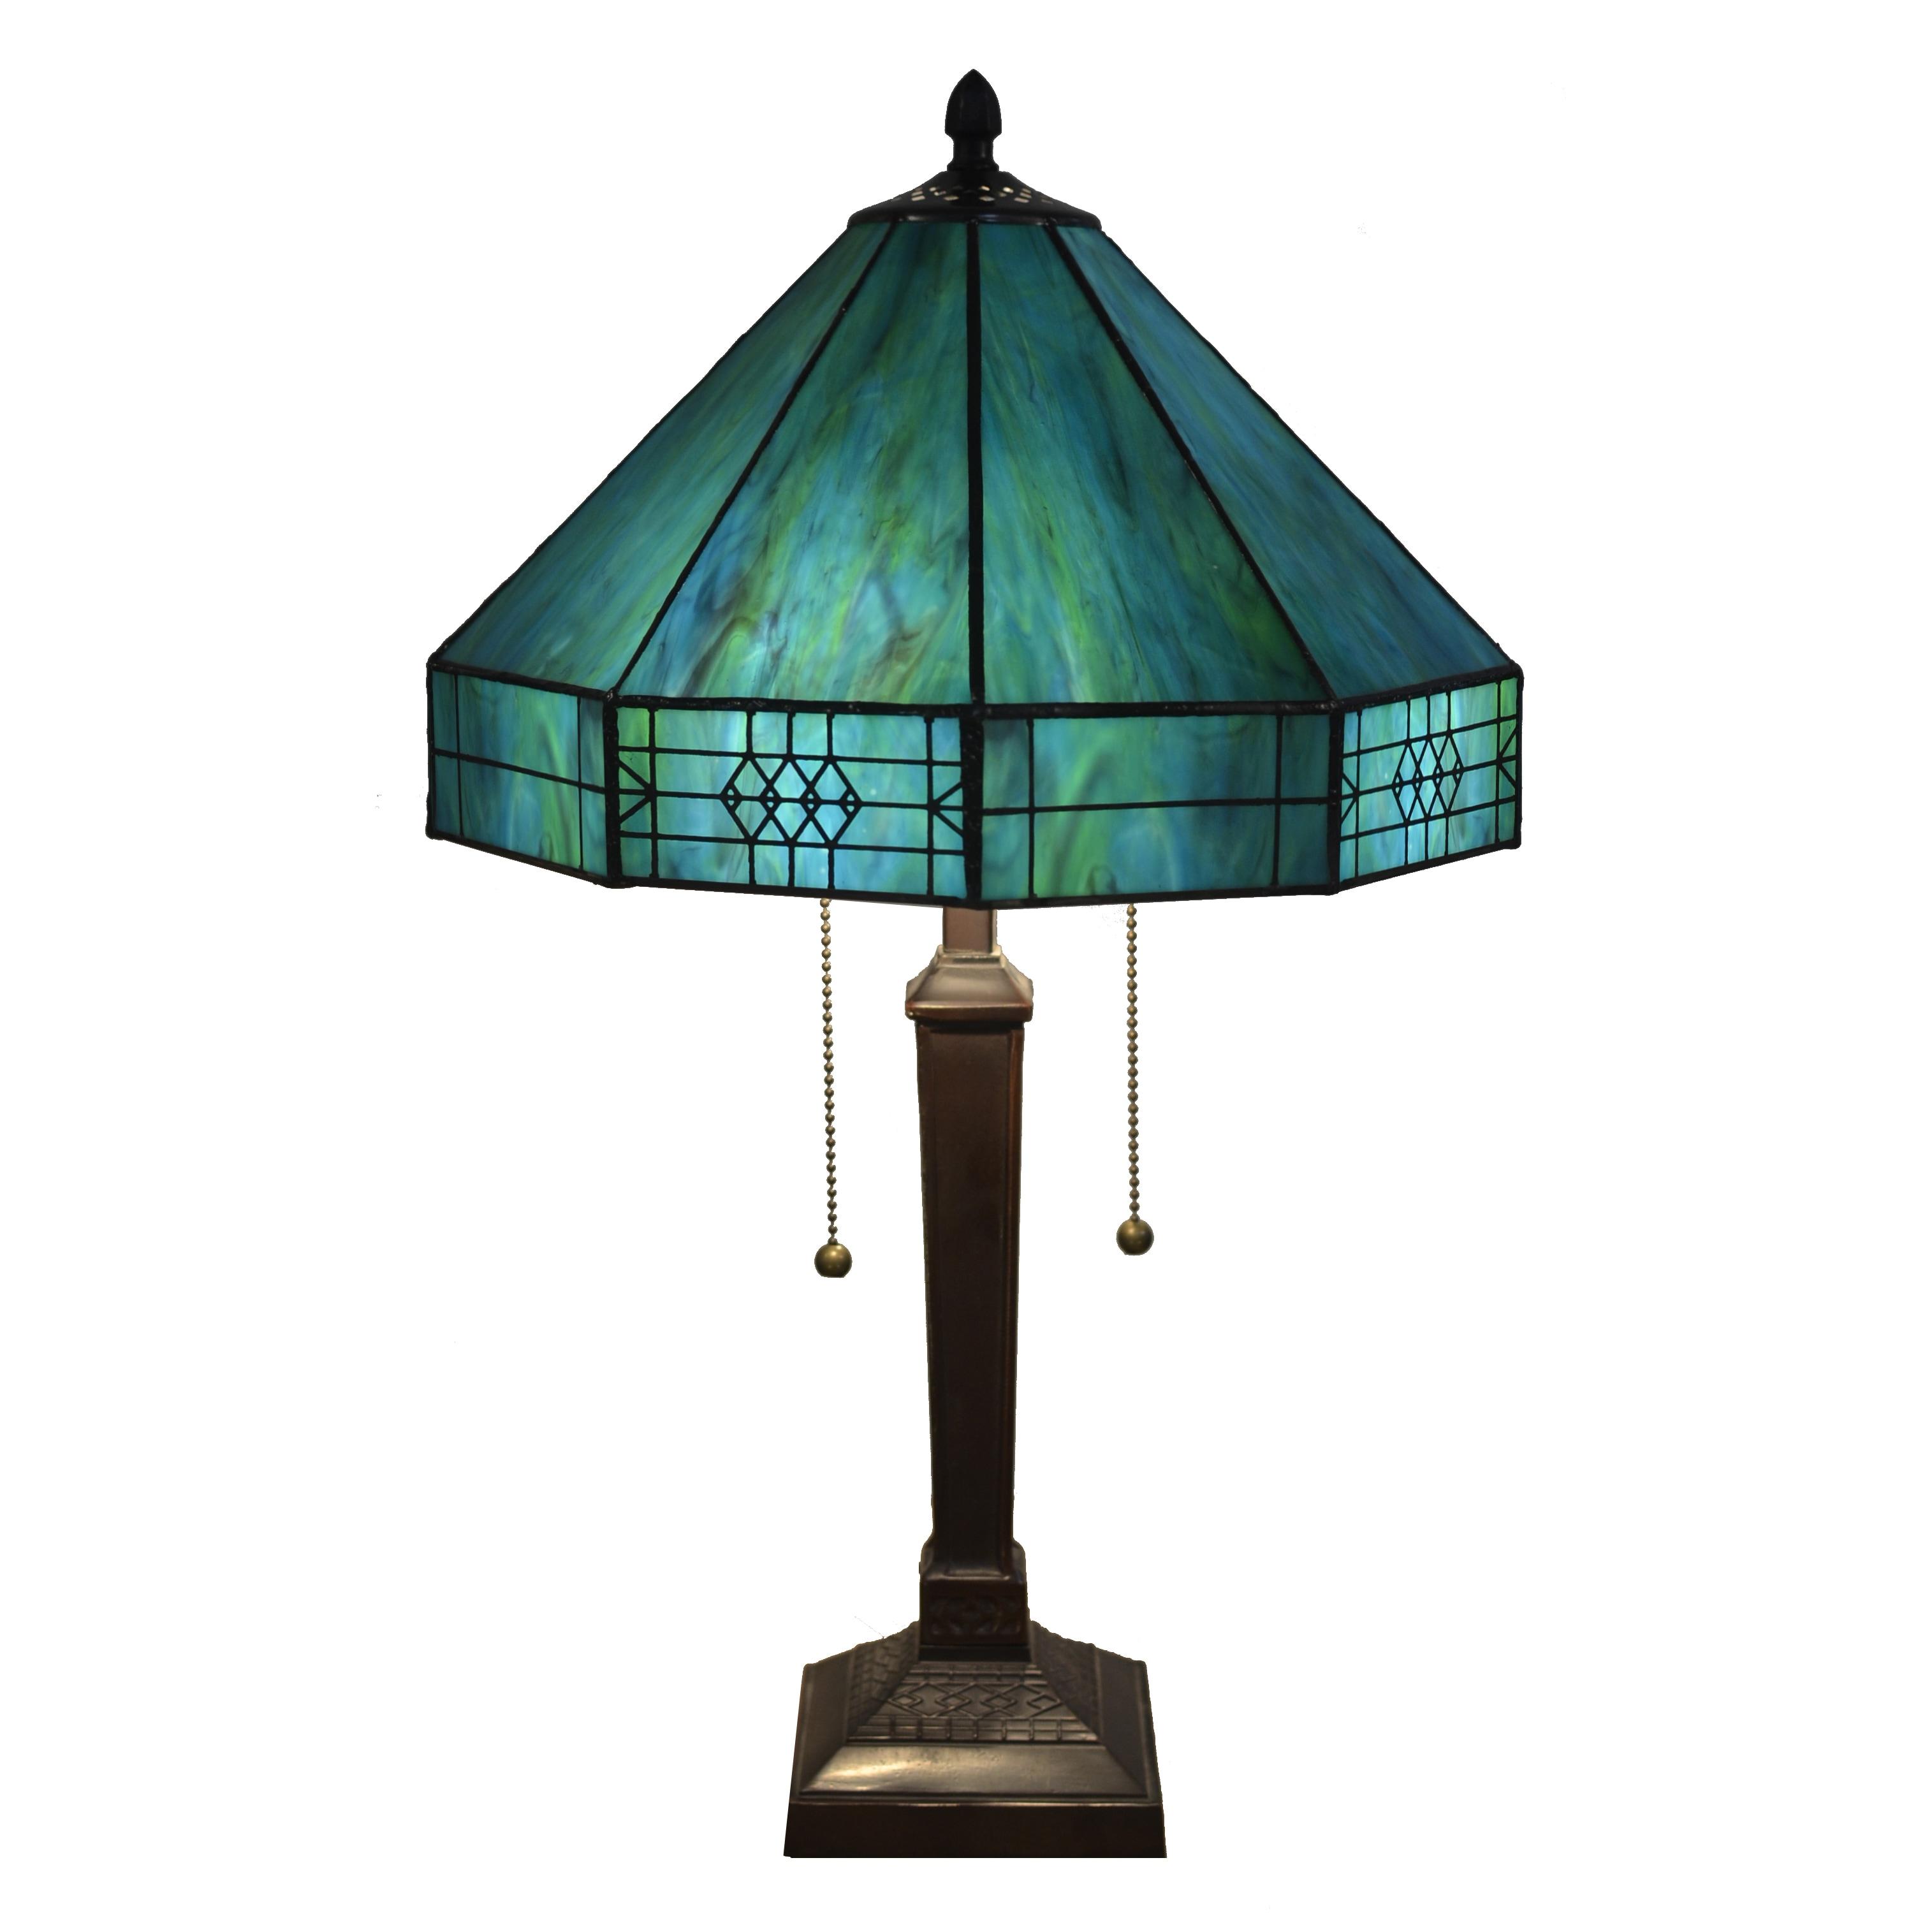 Maeve Tiffany-style 2-light Turquoise Table Lamp (Turquoise Tiffany-style Table Lamp)